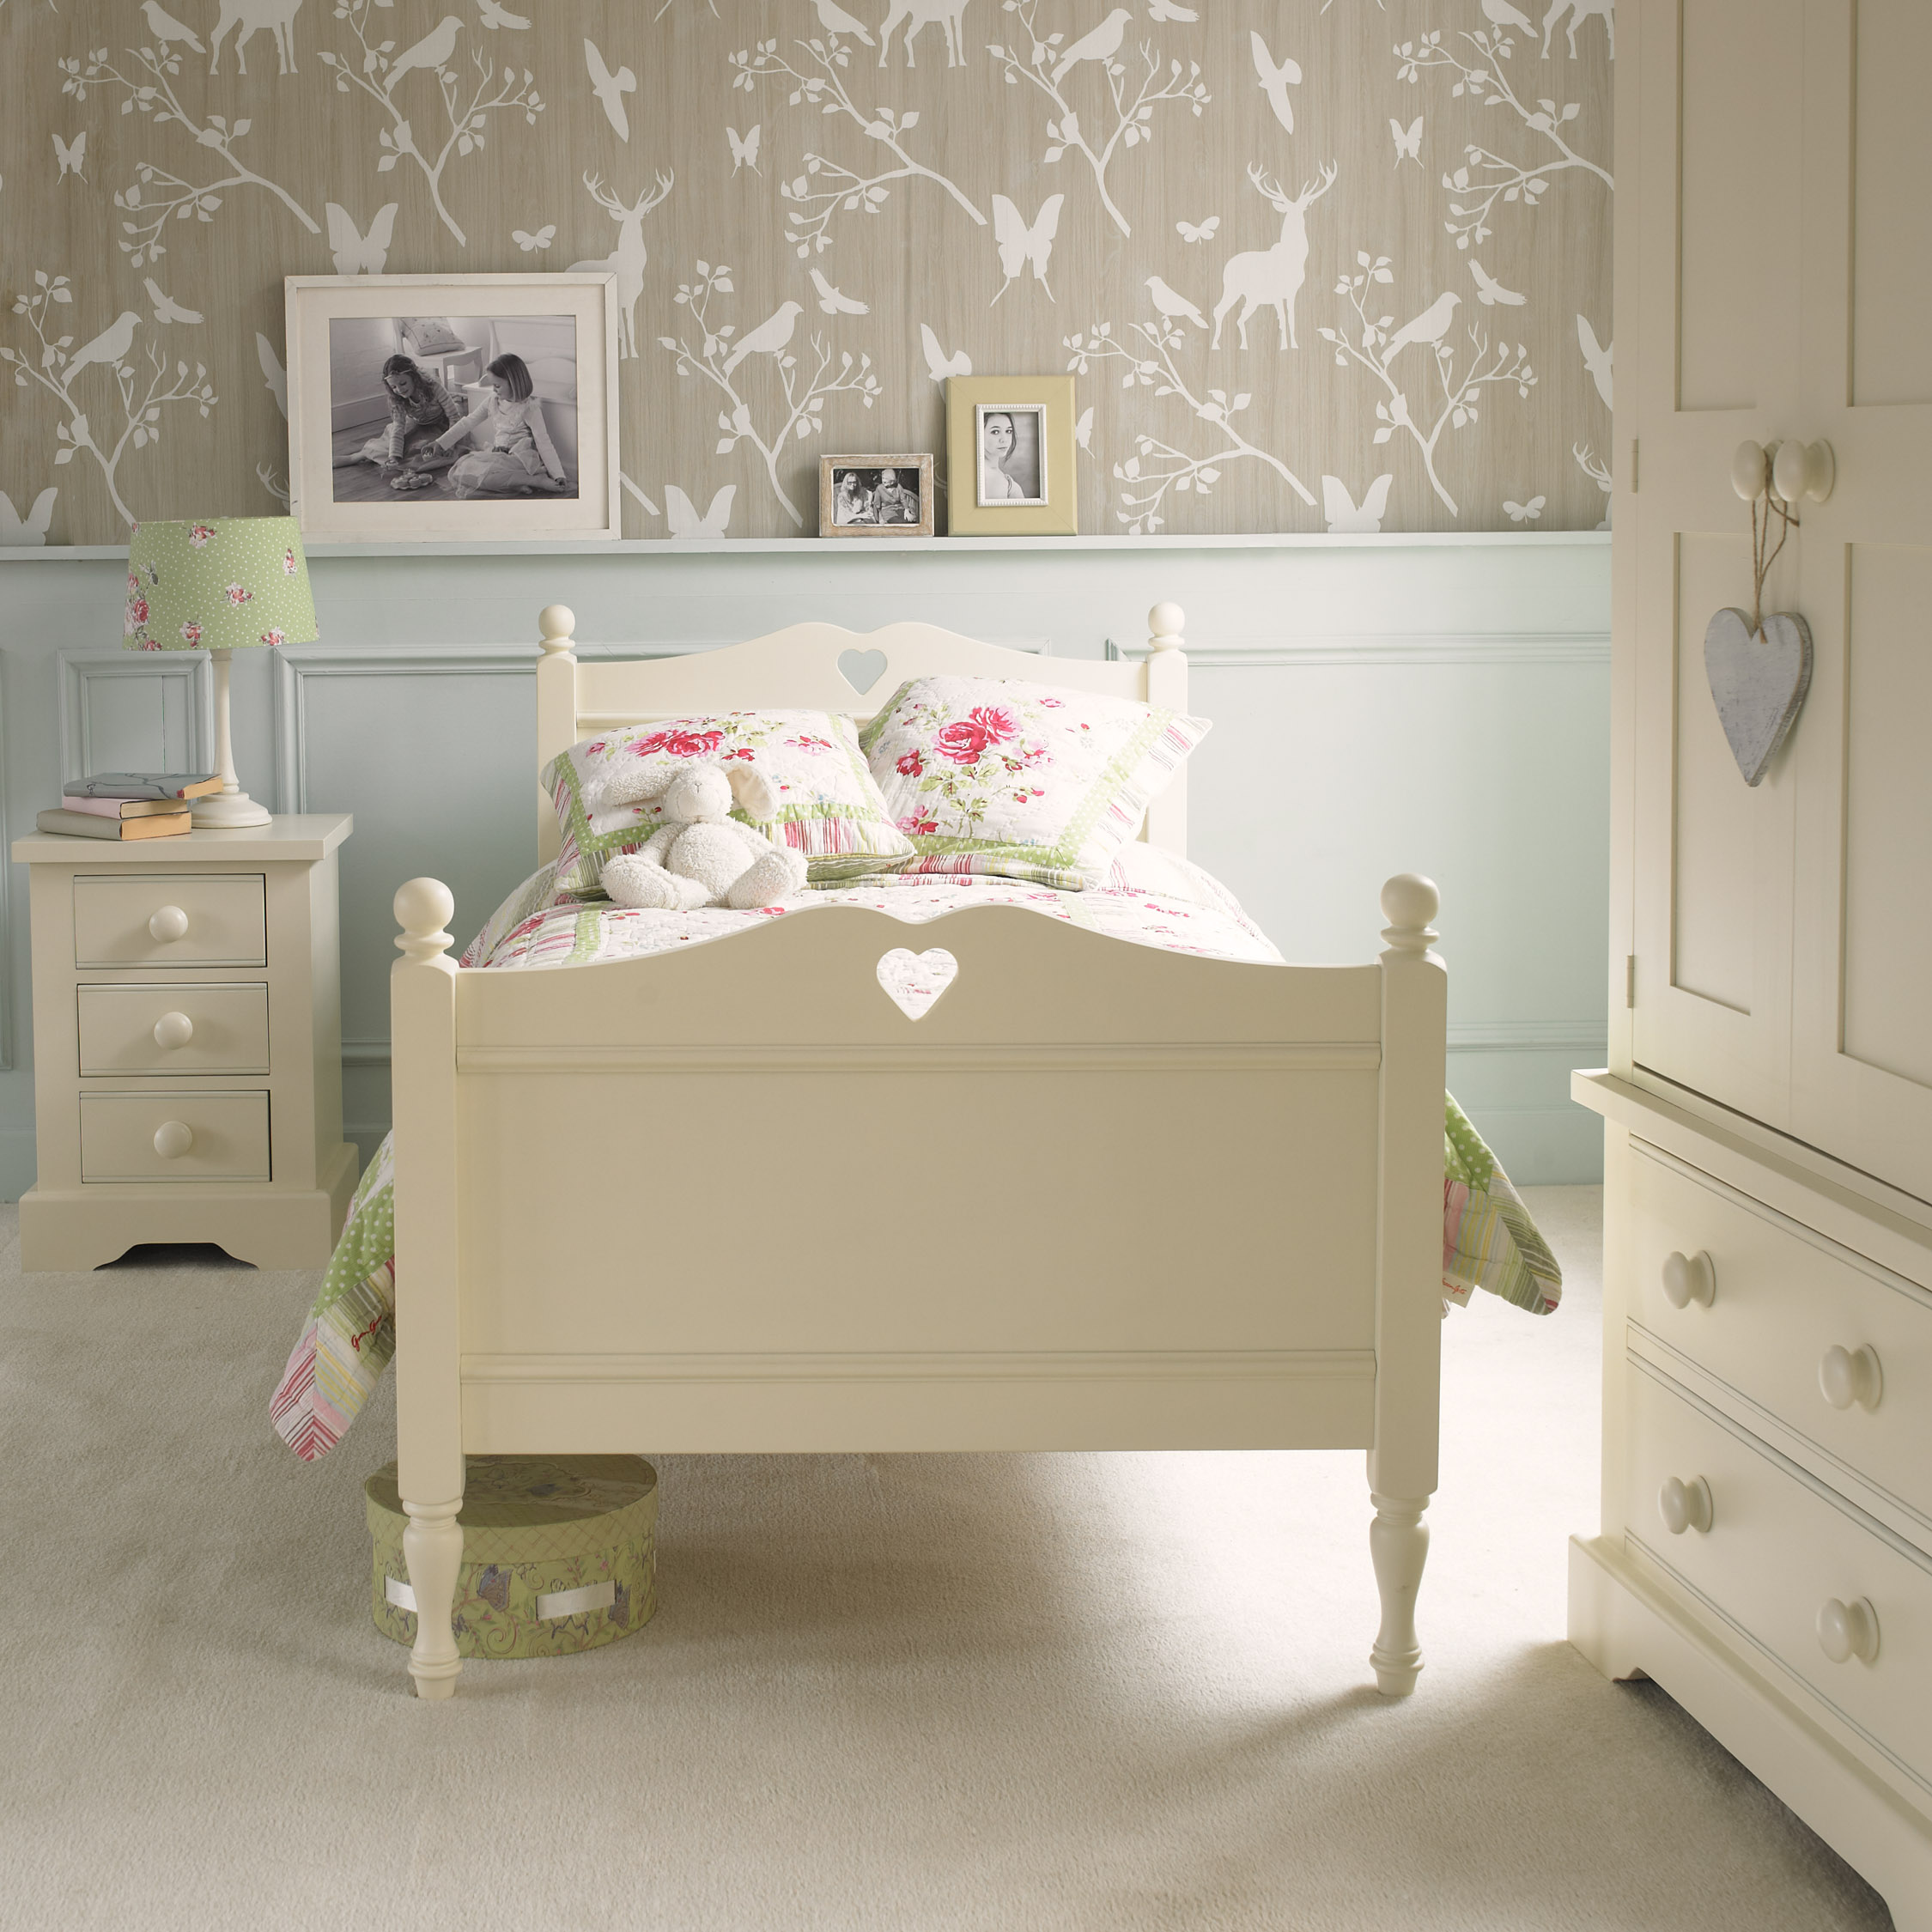 heart bed ivory white by little folks for children